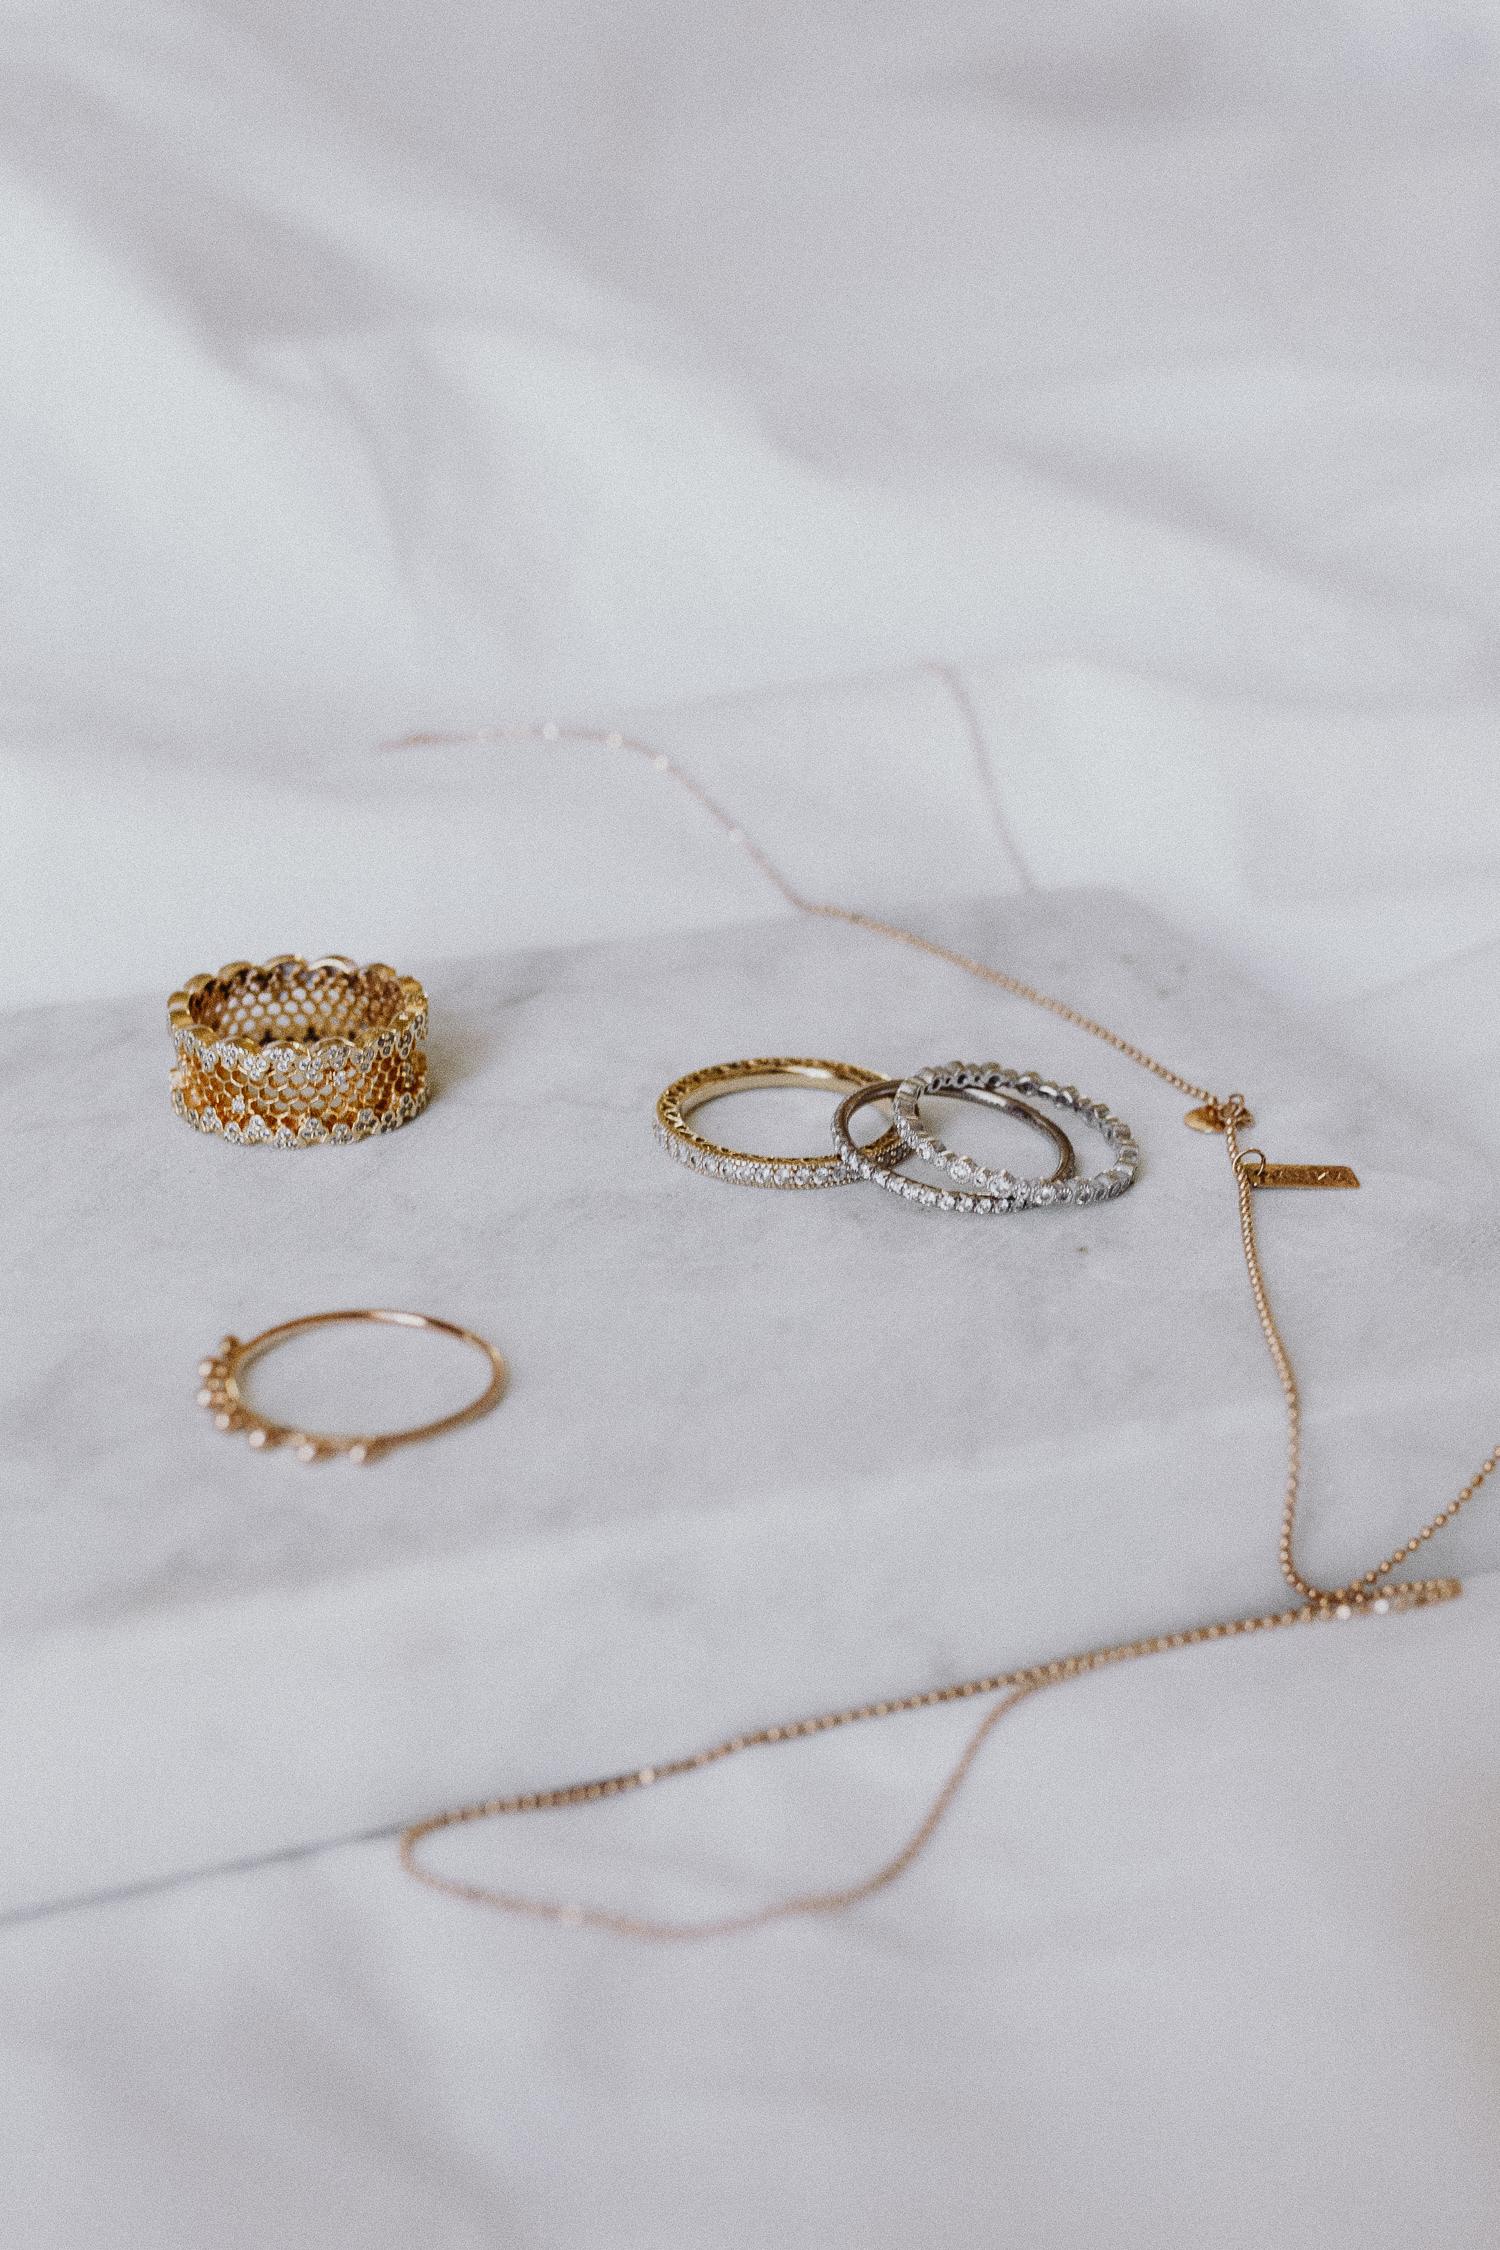 My Every-Day-Jewellery | Bikinis & Passports